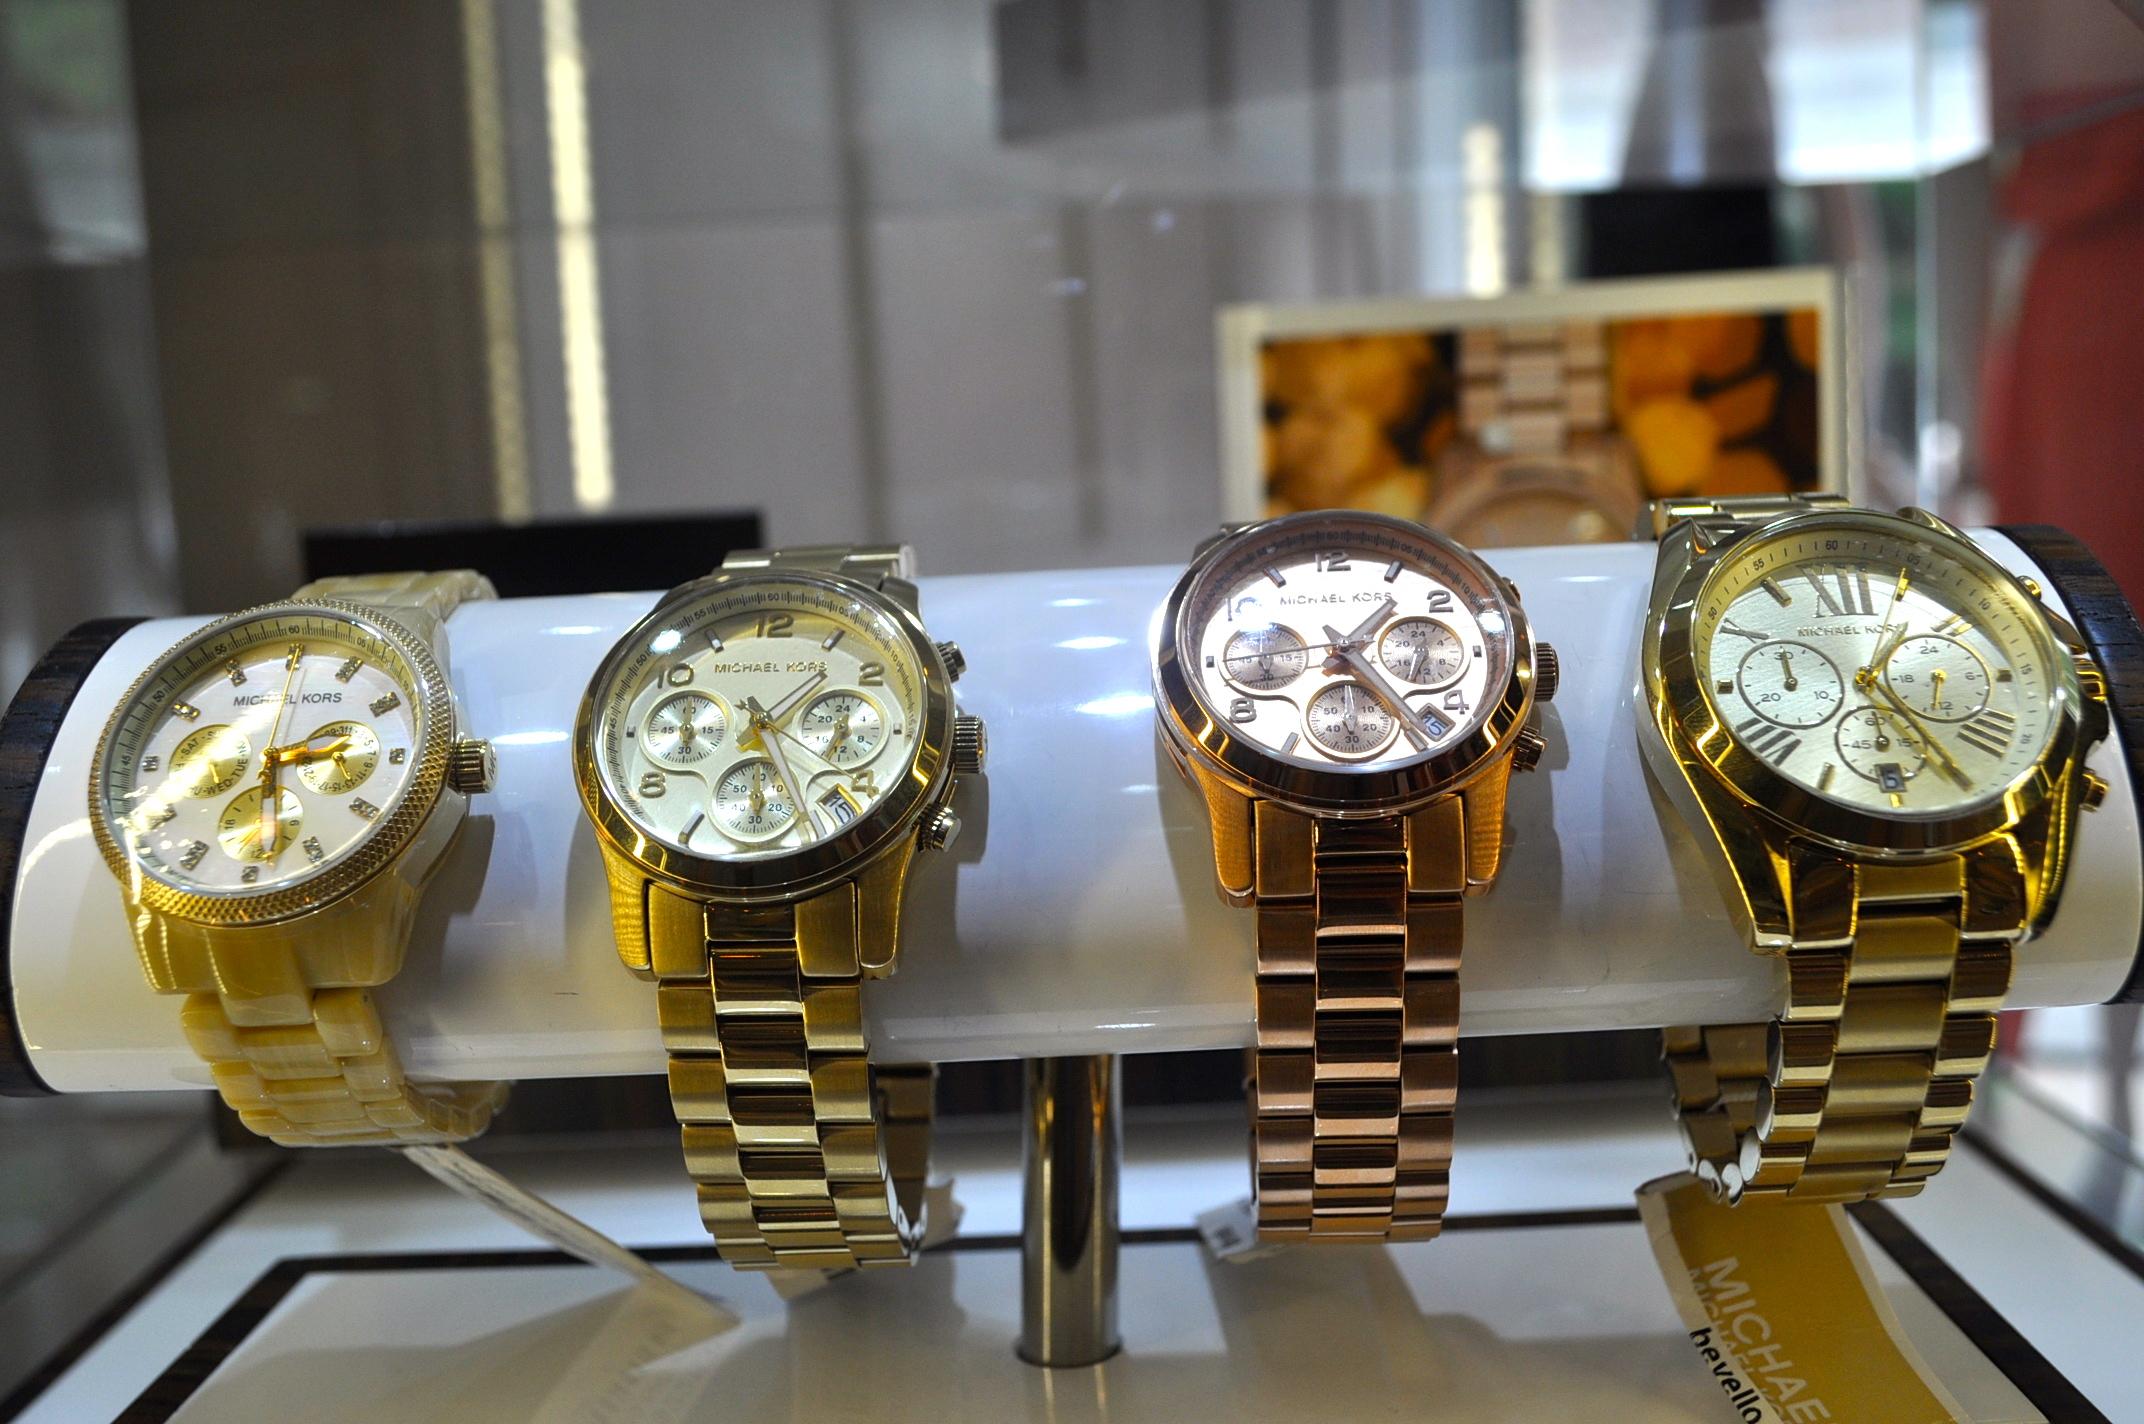 Watches!